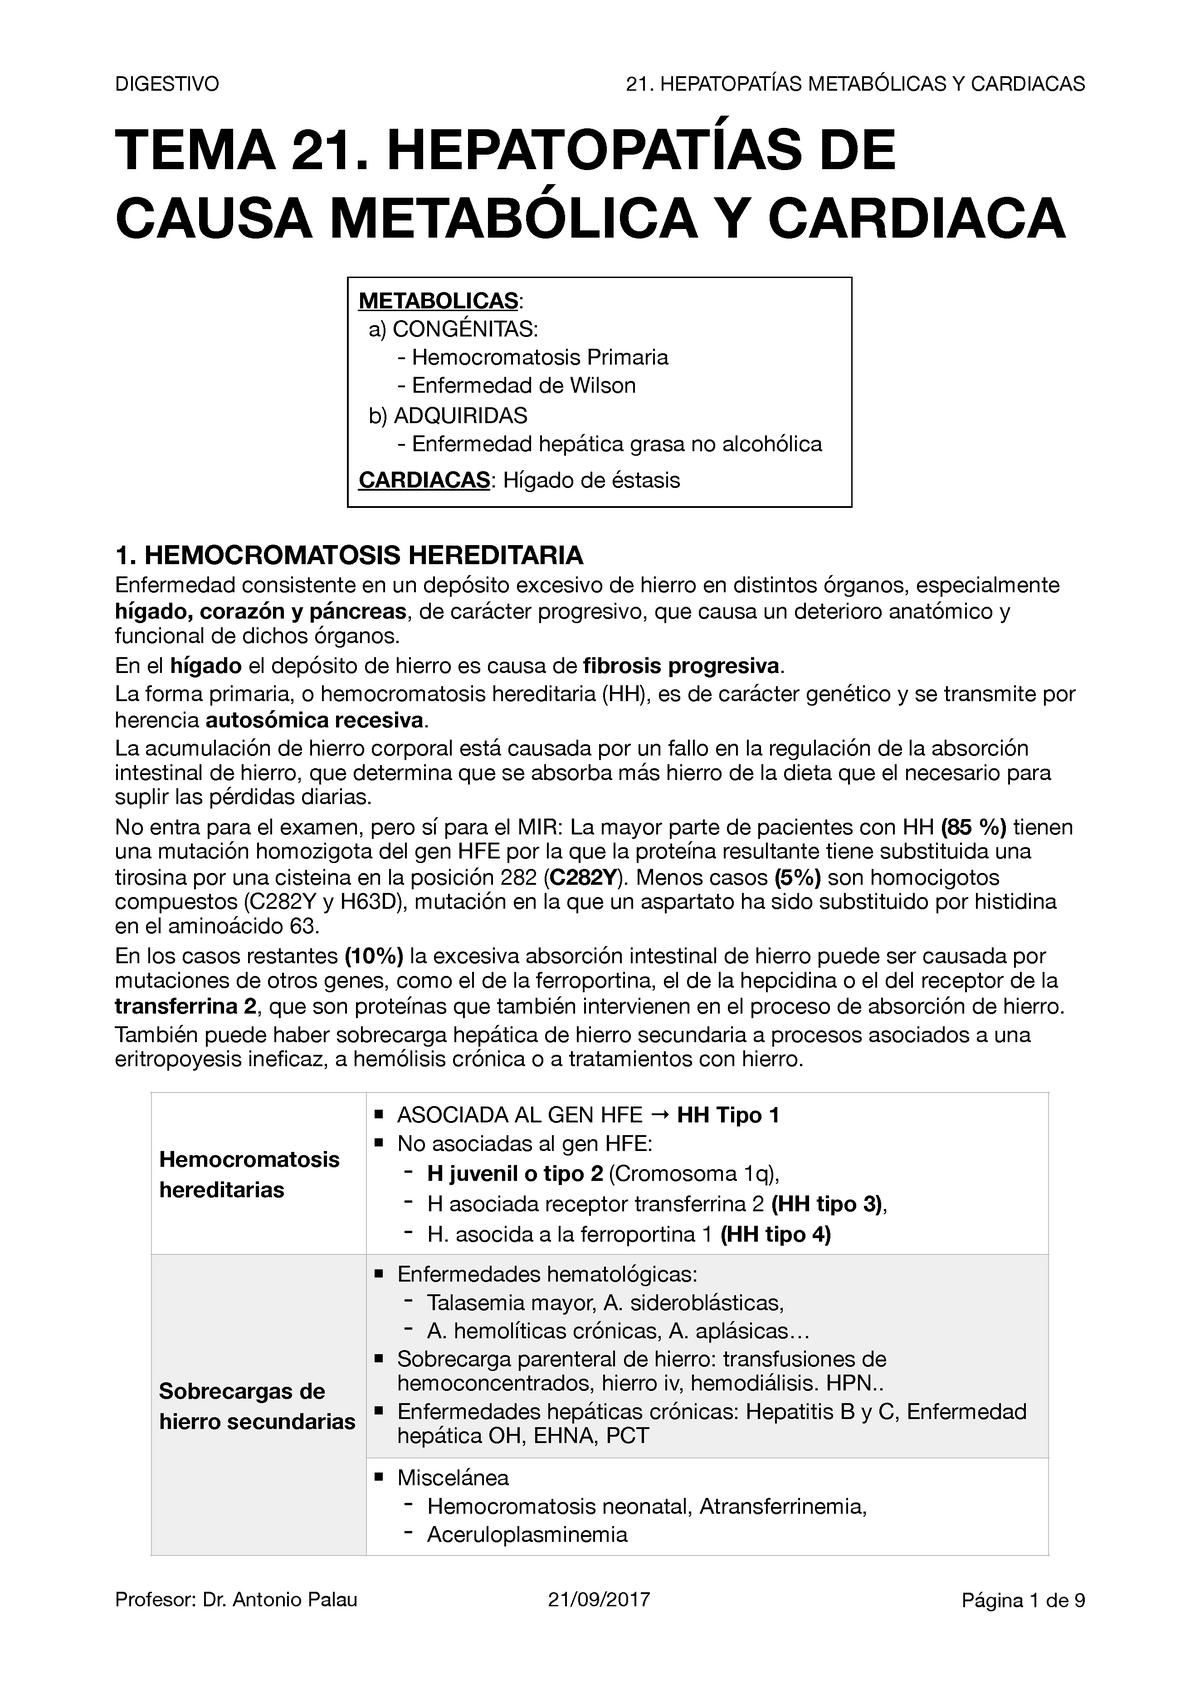 hemocromatosis hereditaria y diabetes mellitus